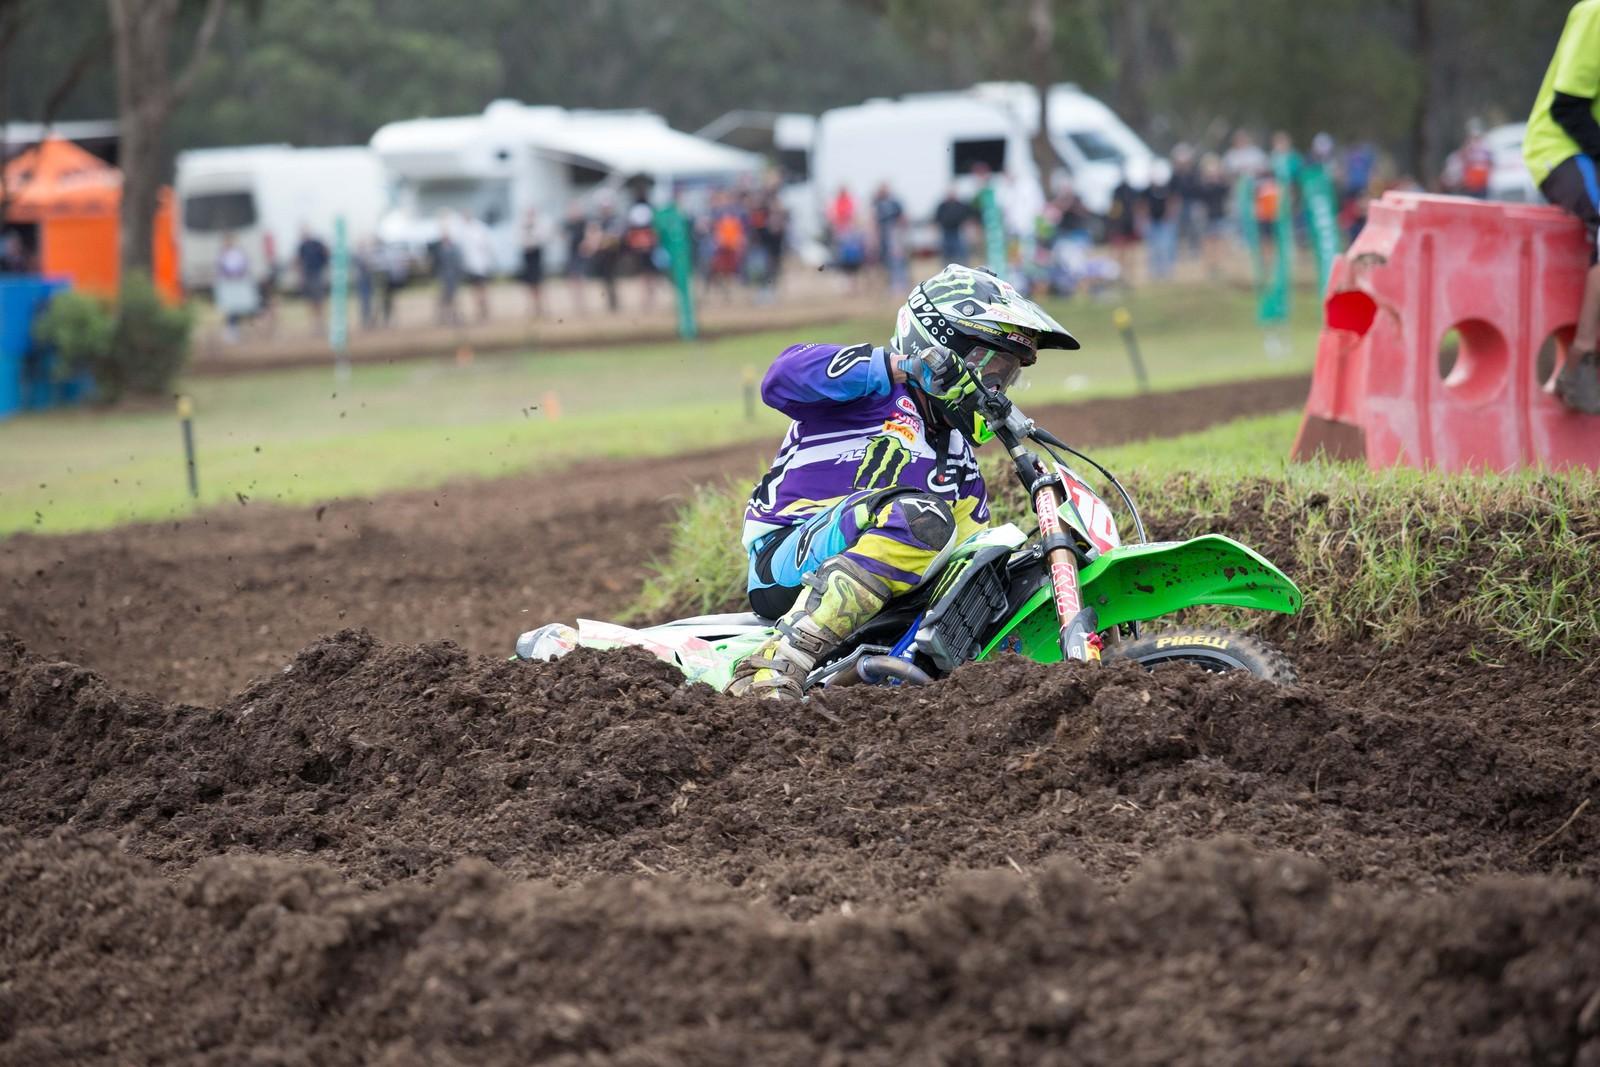 Matt Moss - Australian Motul Motocross Nationals Round 2, Appin - Motocross Pictures - Vital MX